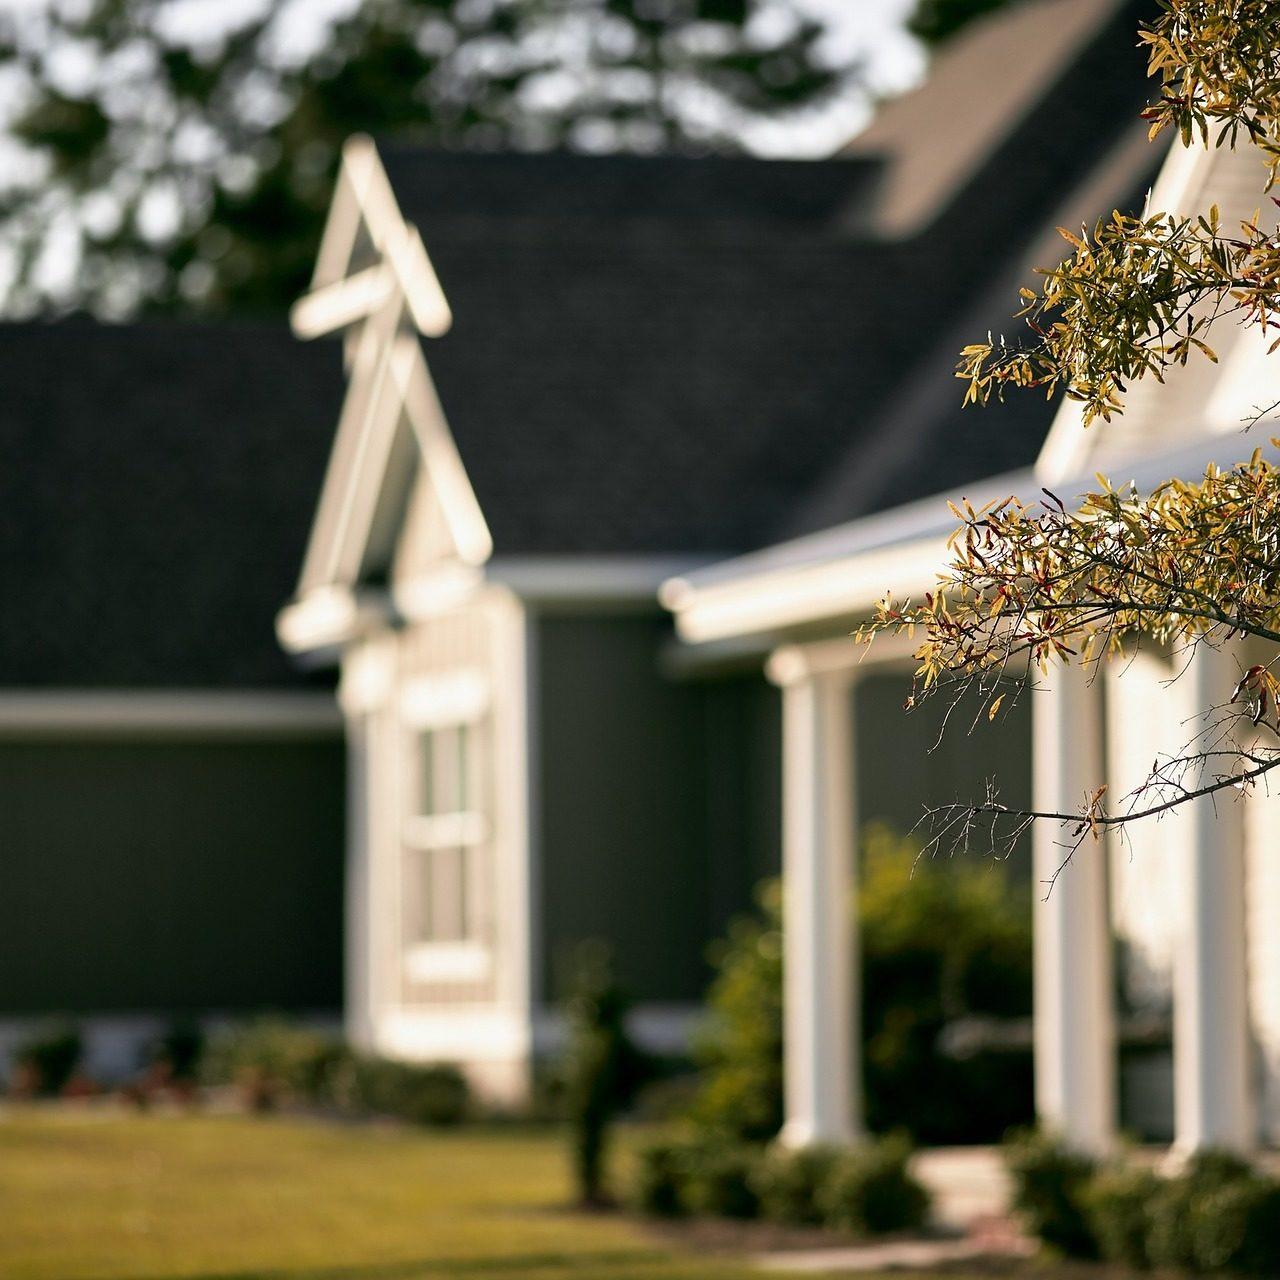 houses-691586_1920